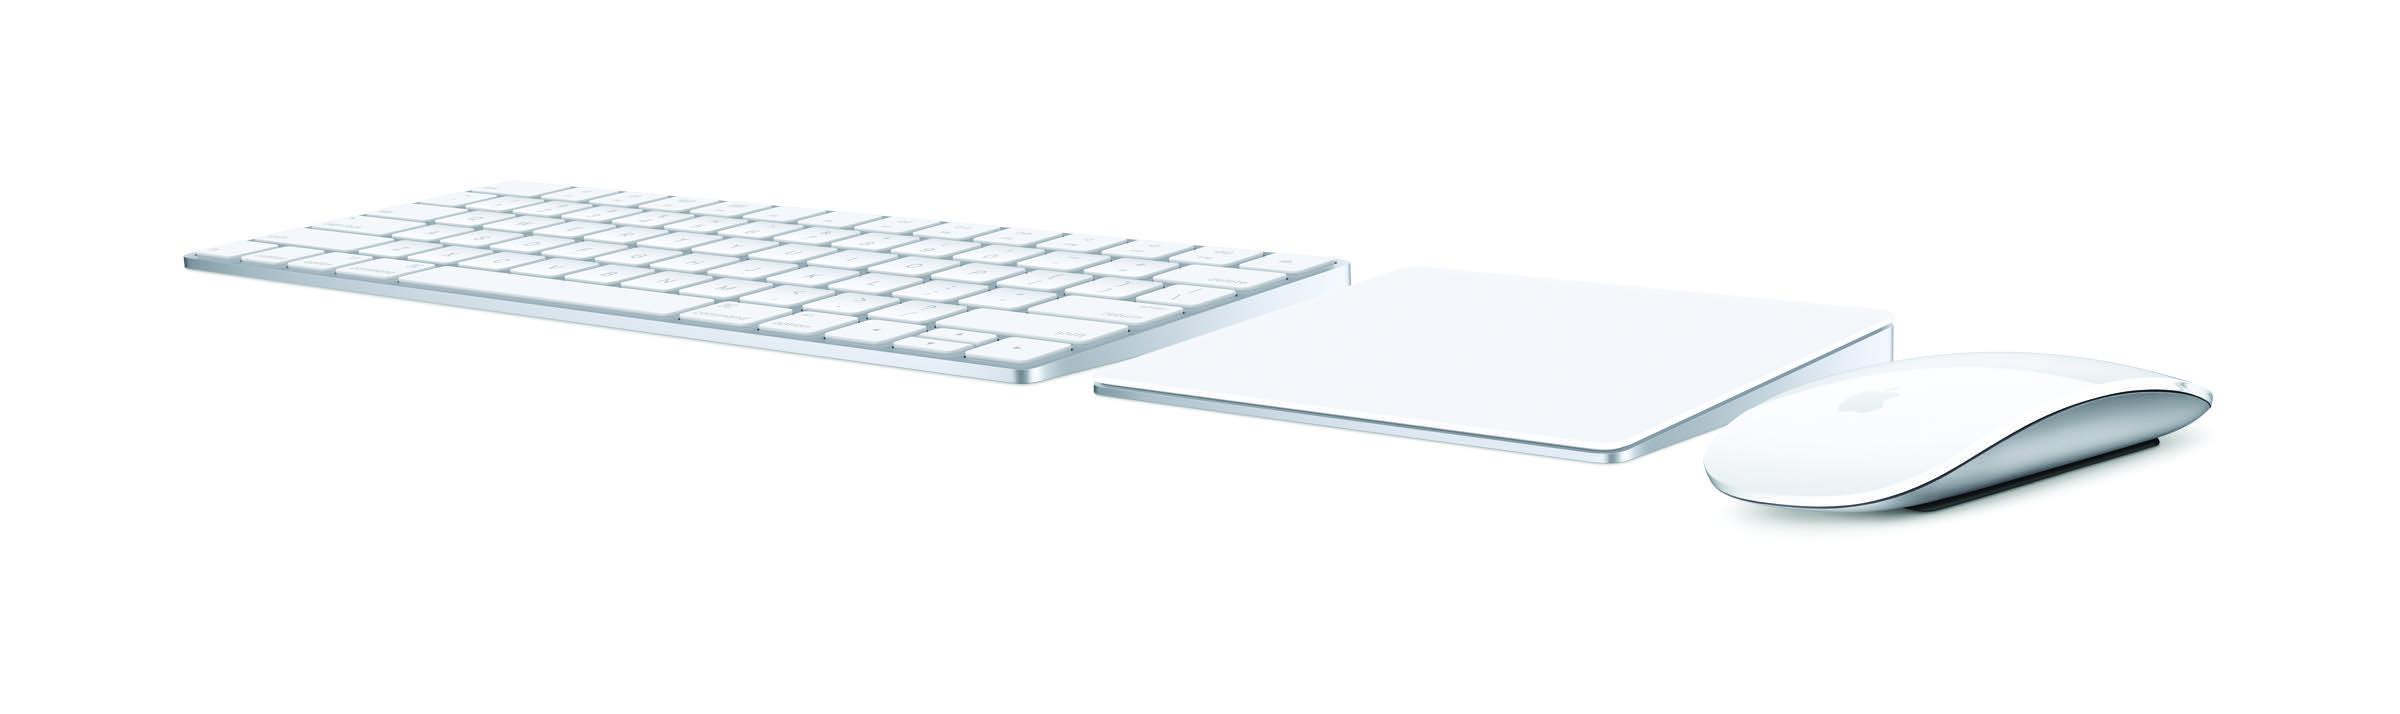 Magic Keyboard, Magic Mouse 2 und Magic Trackpad 2